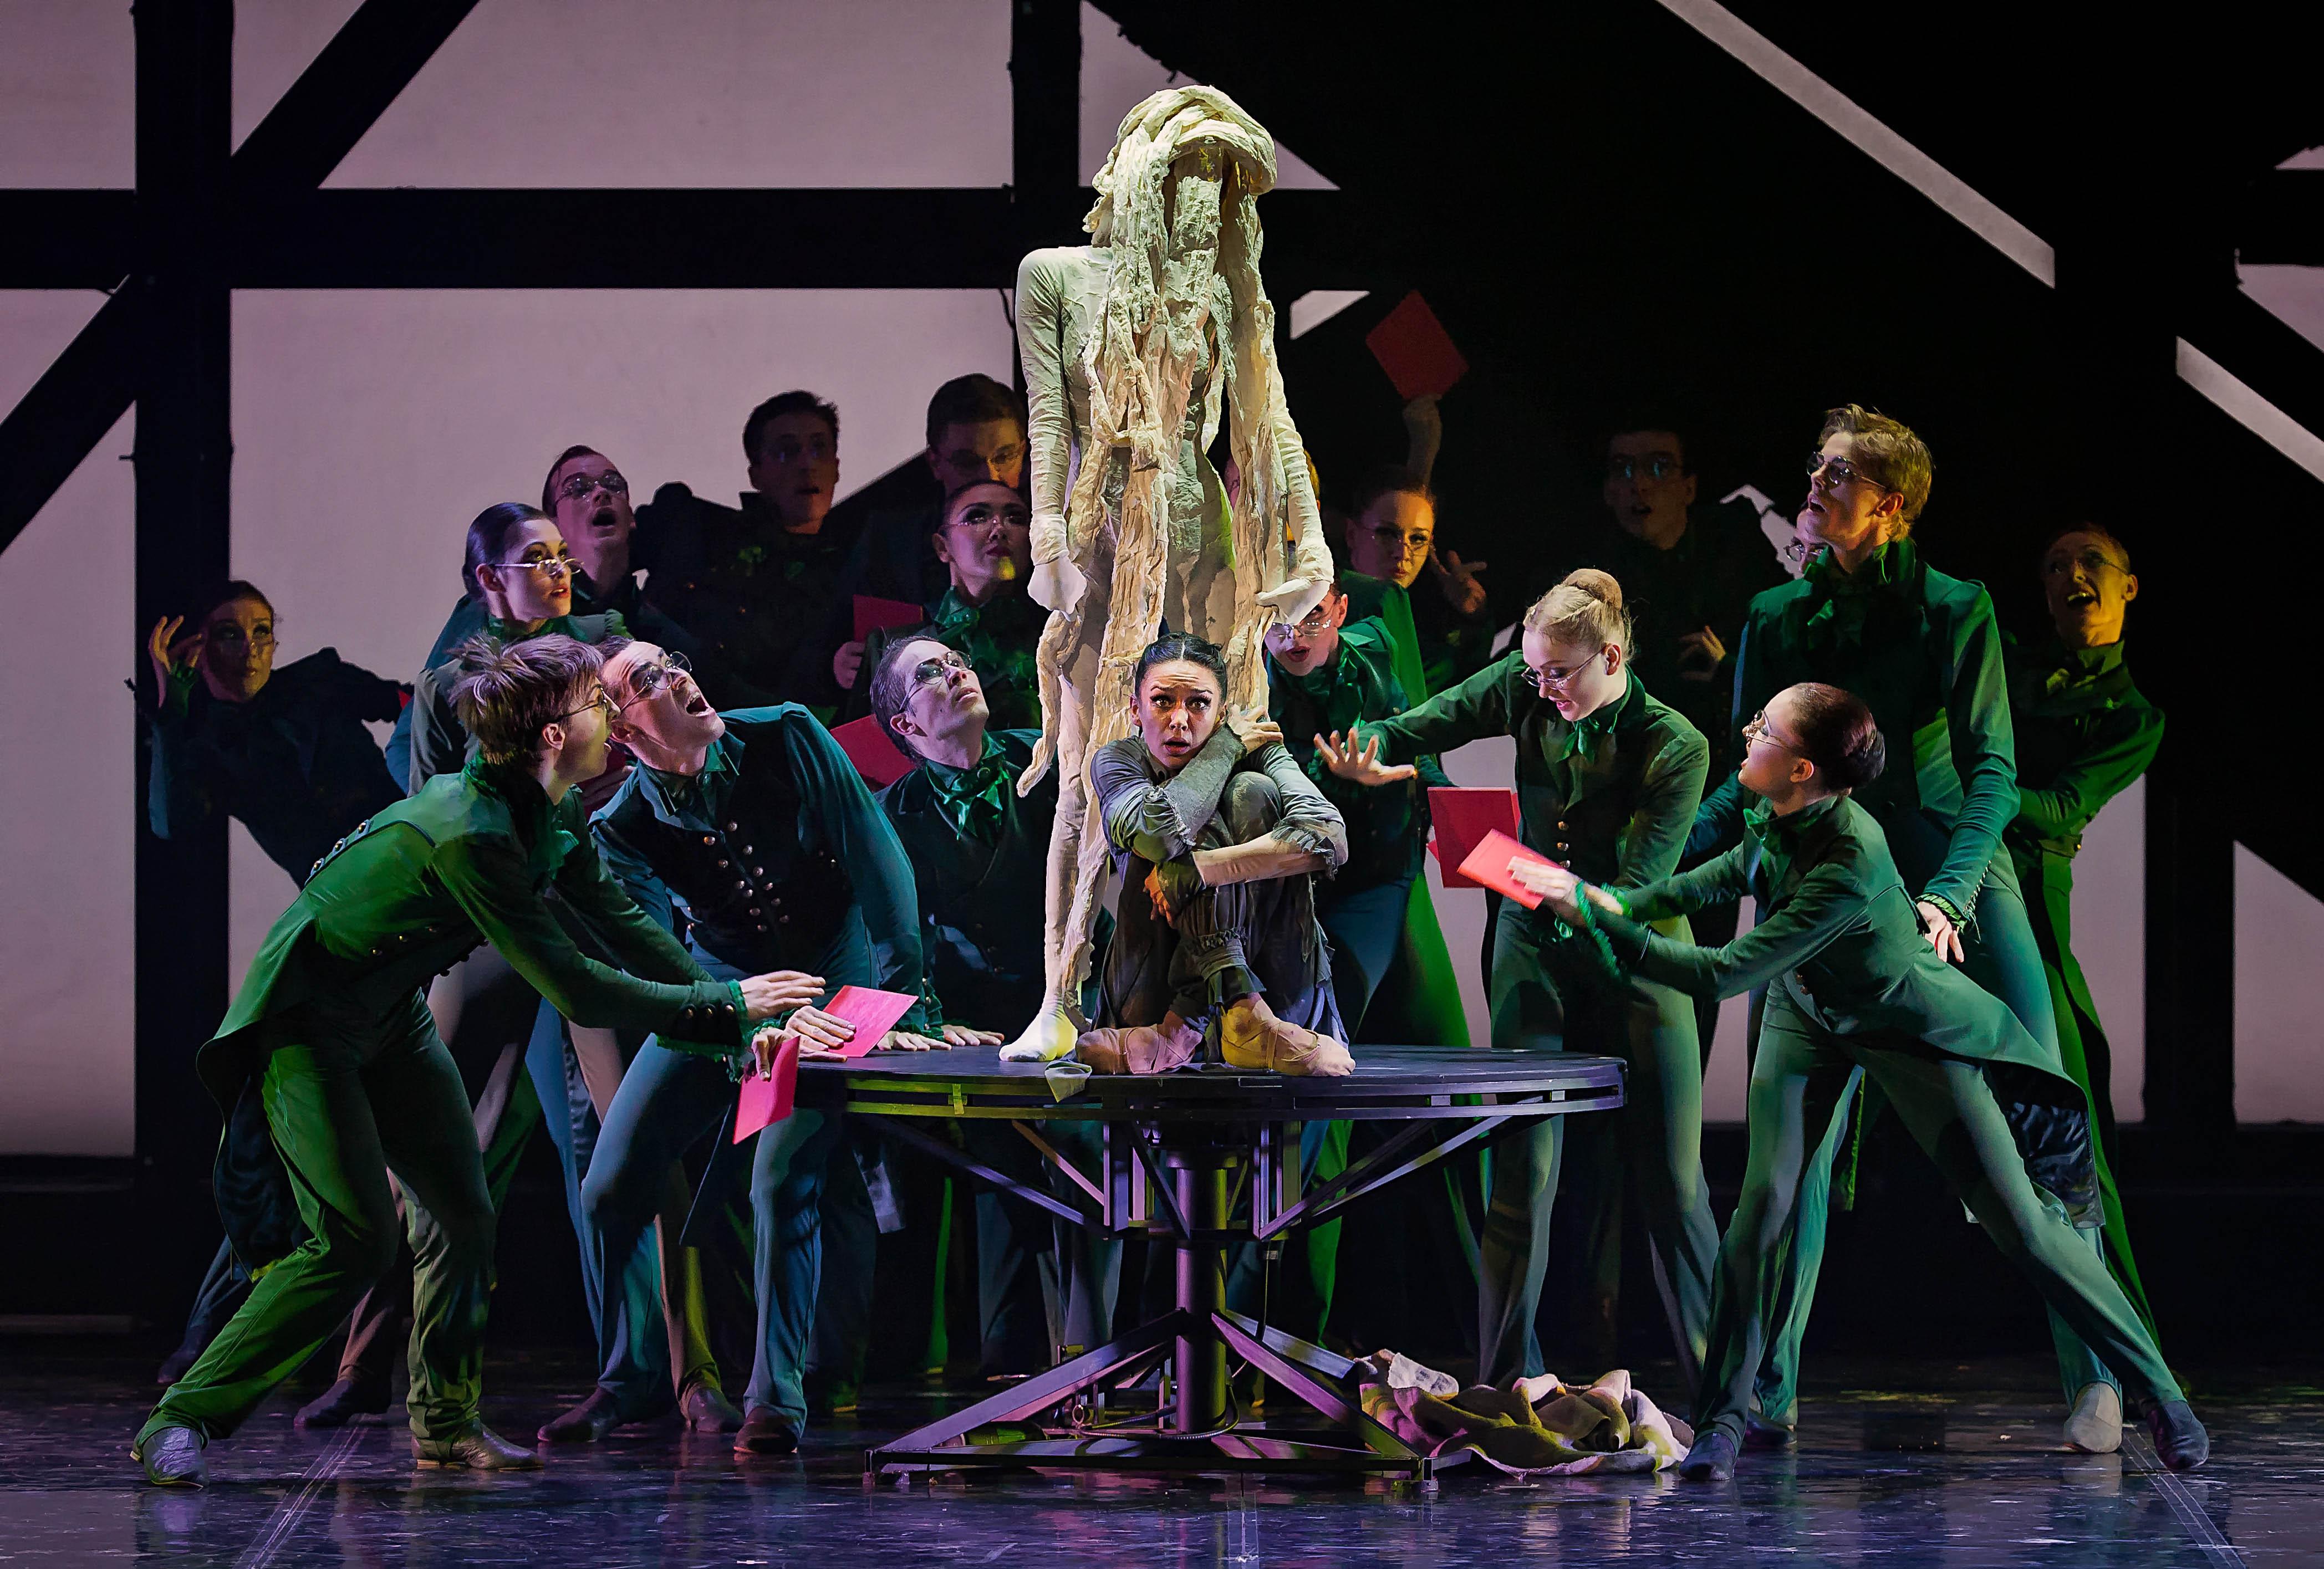 Борис Эйфман на балетных качелях судьбы